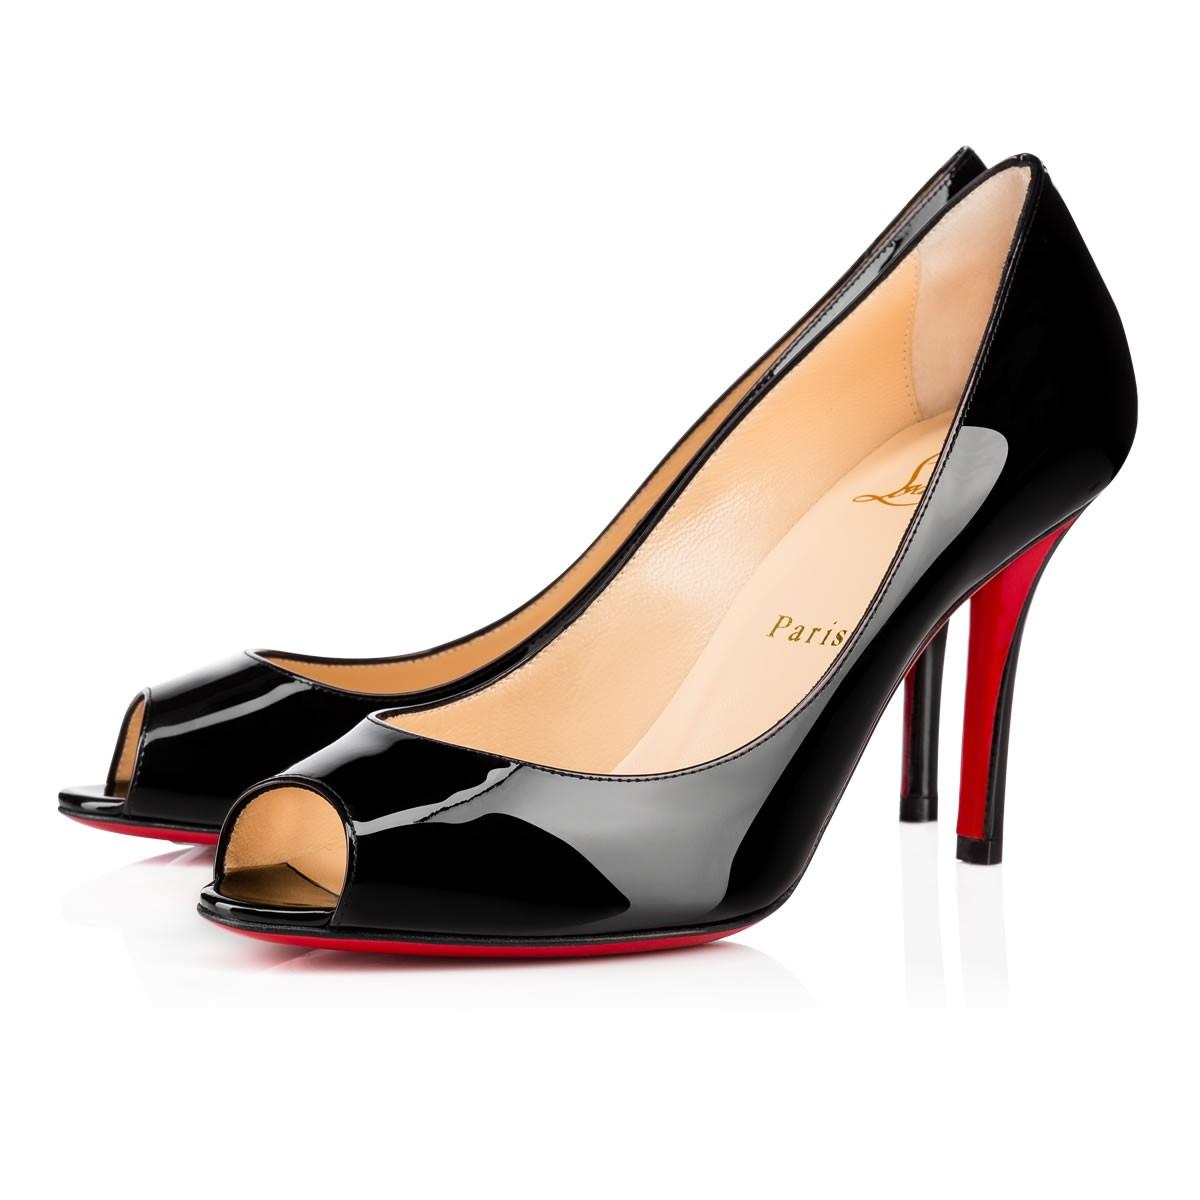 peep-toes-christian-louboutin-negros